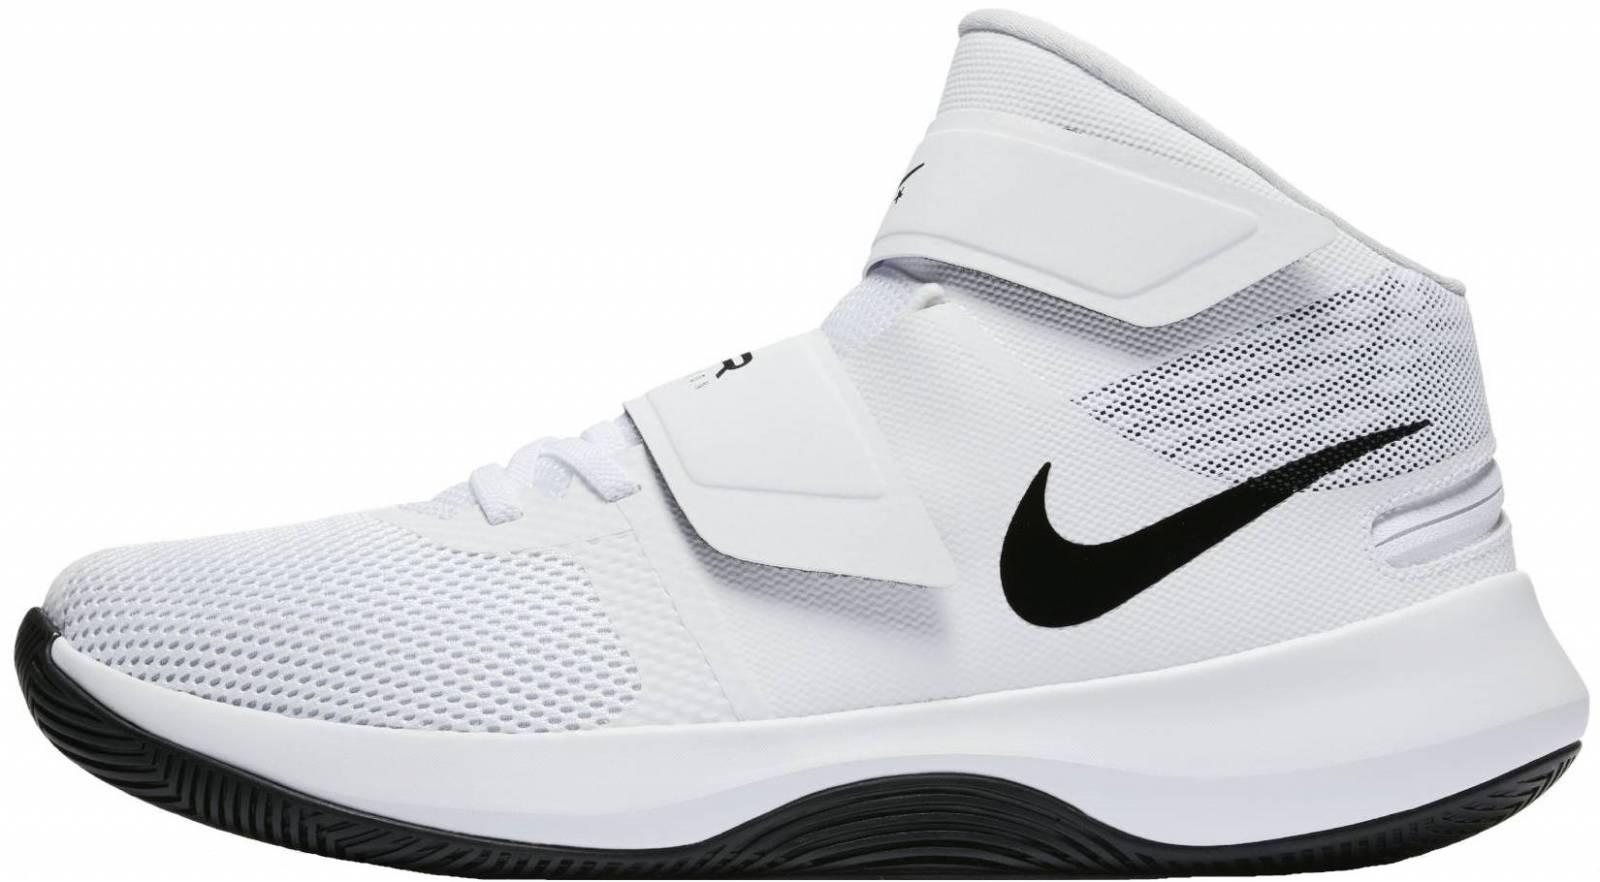 Save 29% on Nike Cheap Basketball Shoes